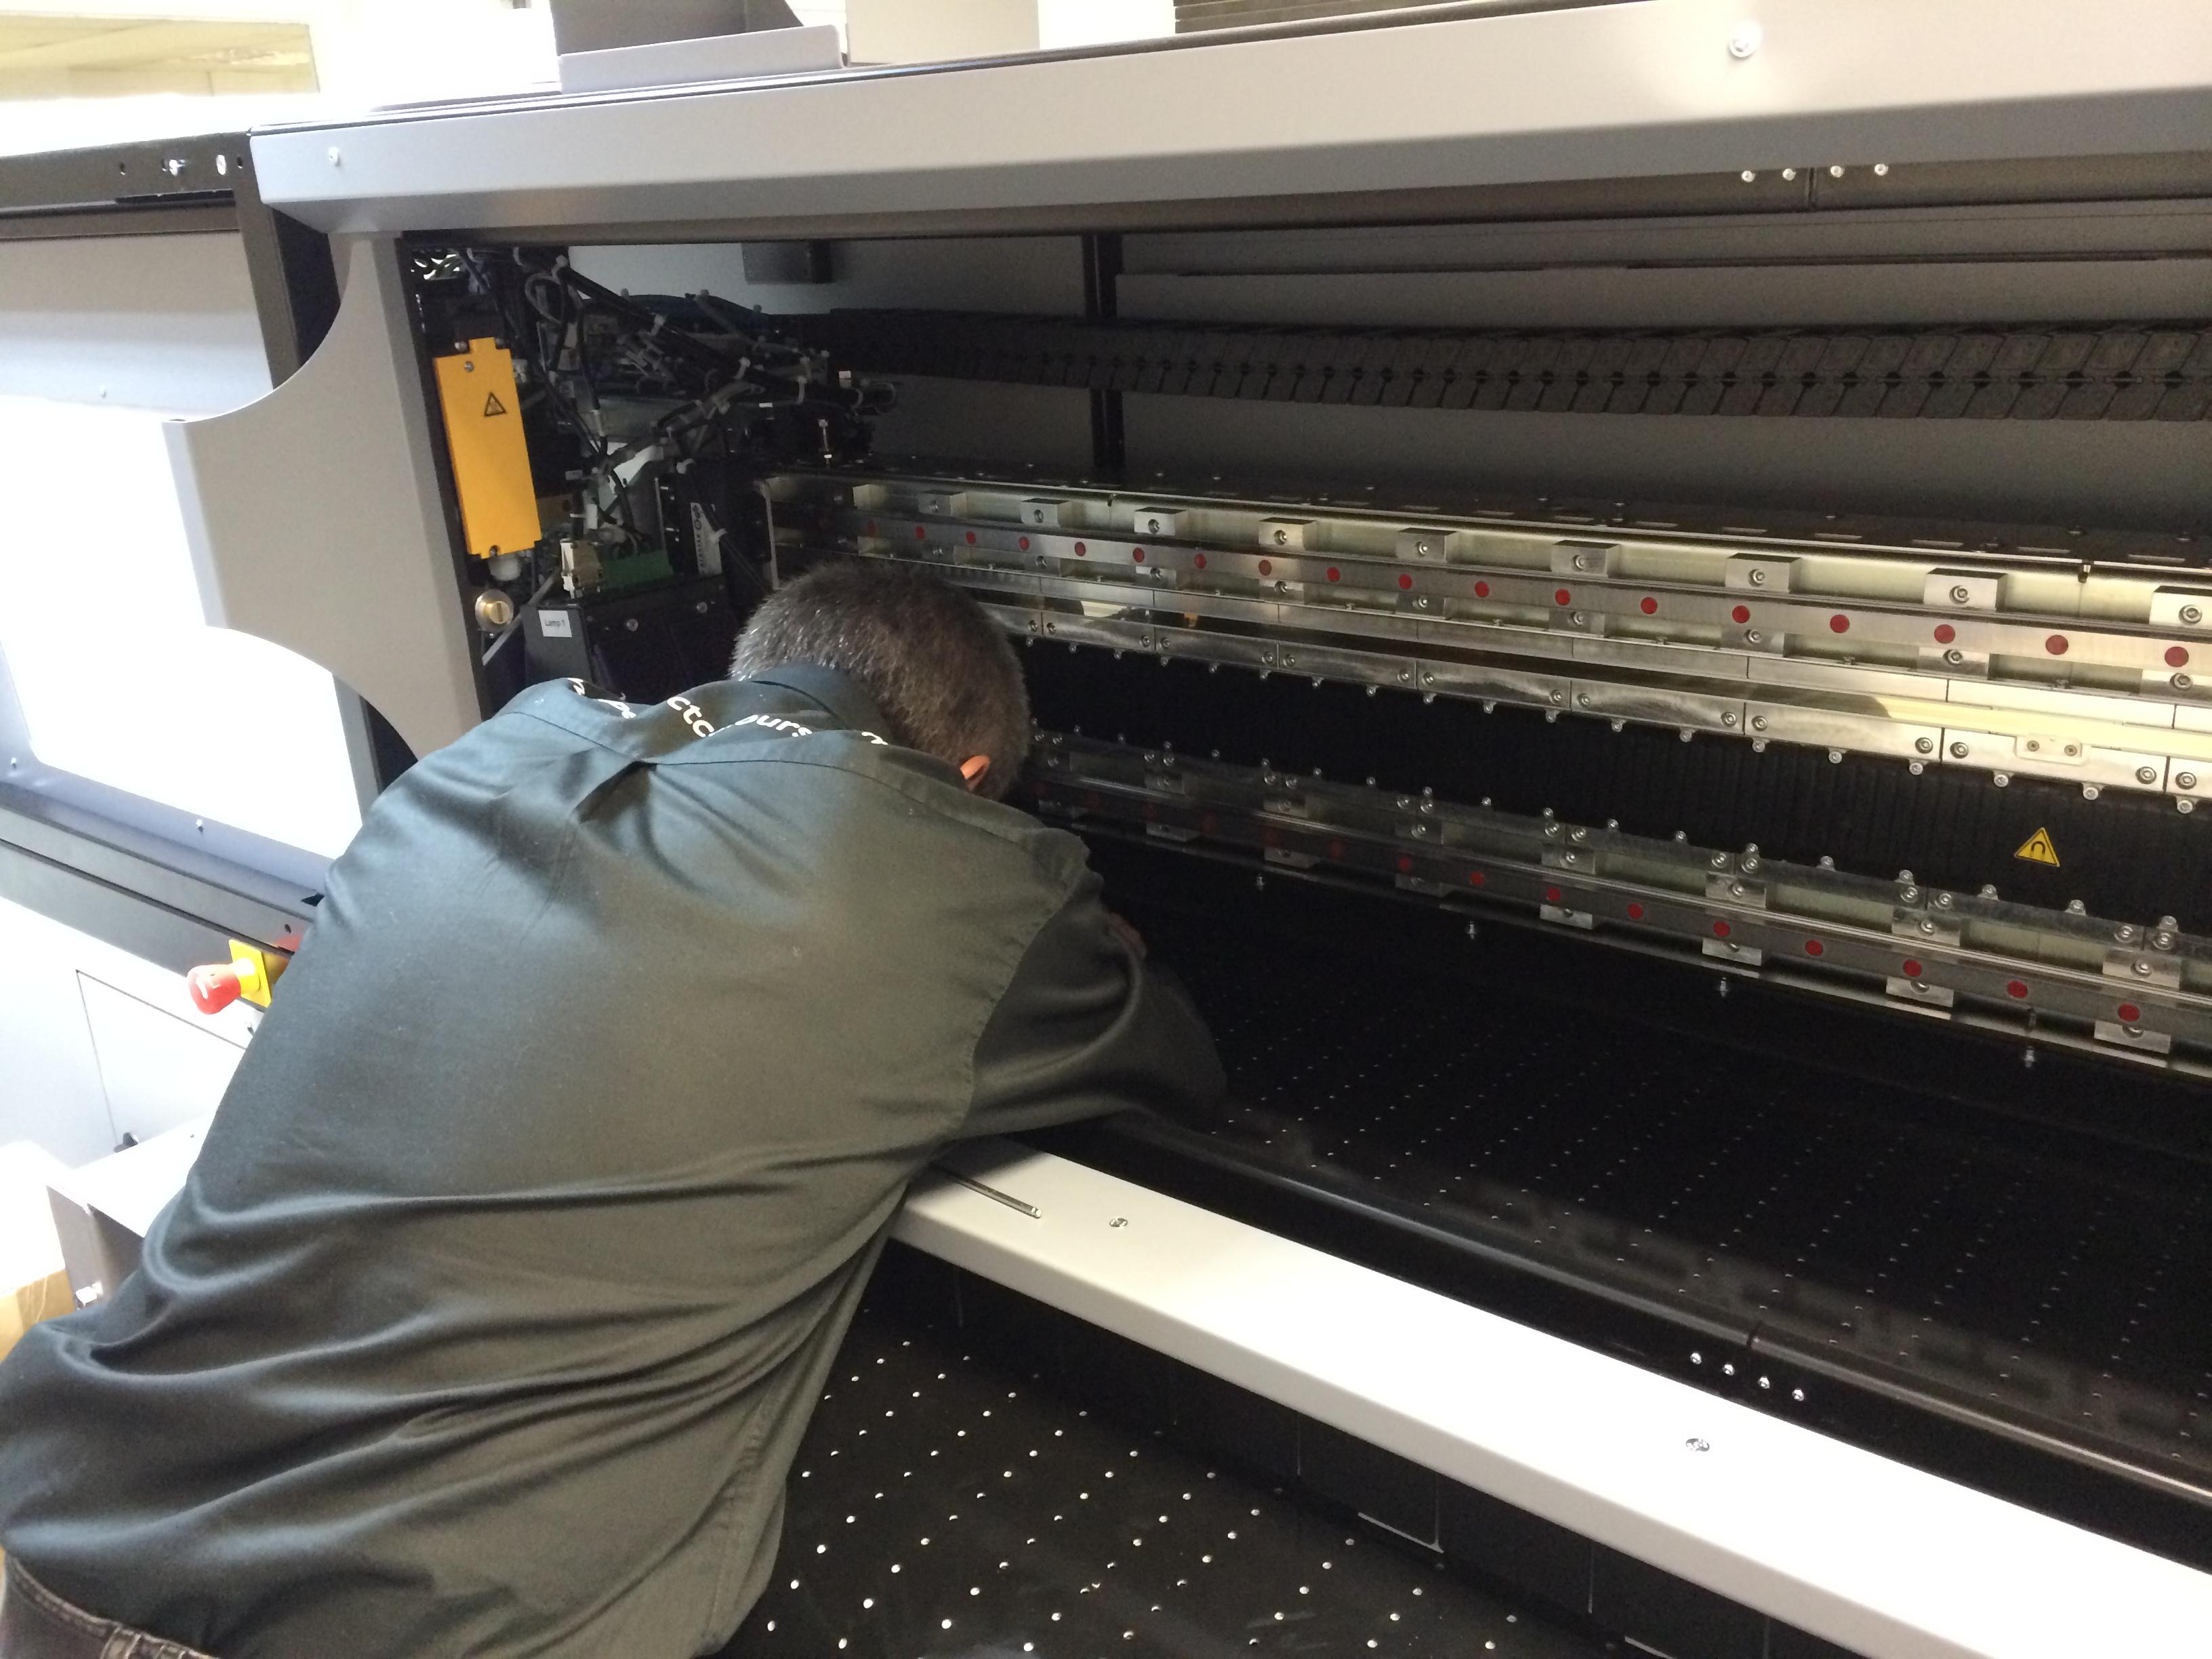 Duncan sticks his head in the machine